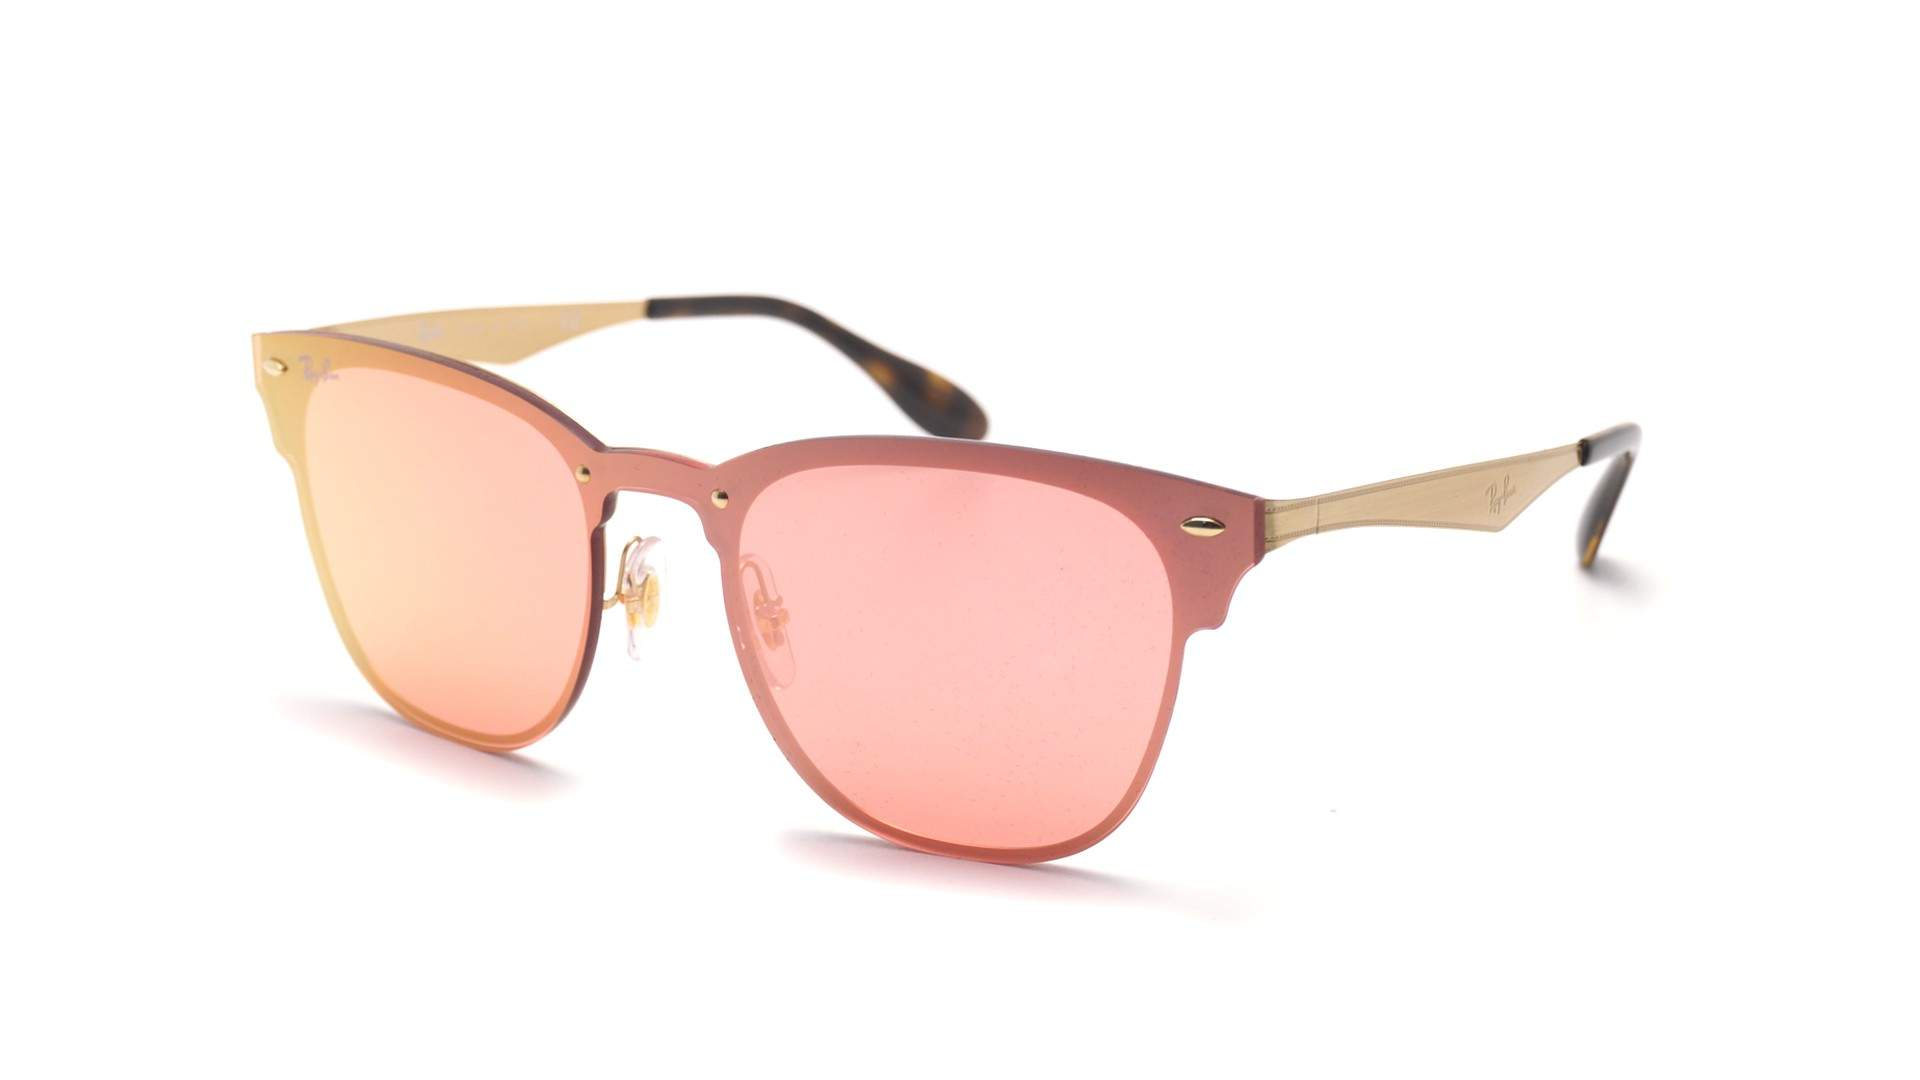 aae43b03881 Sunglasses Ray-Ban Clubmaster Blaze Gold RB3576N 043 E4 Large Mirror